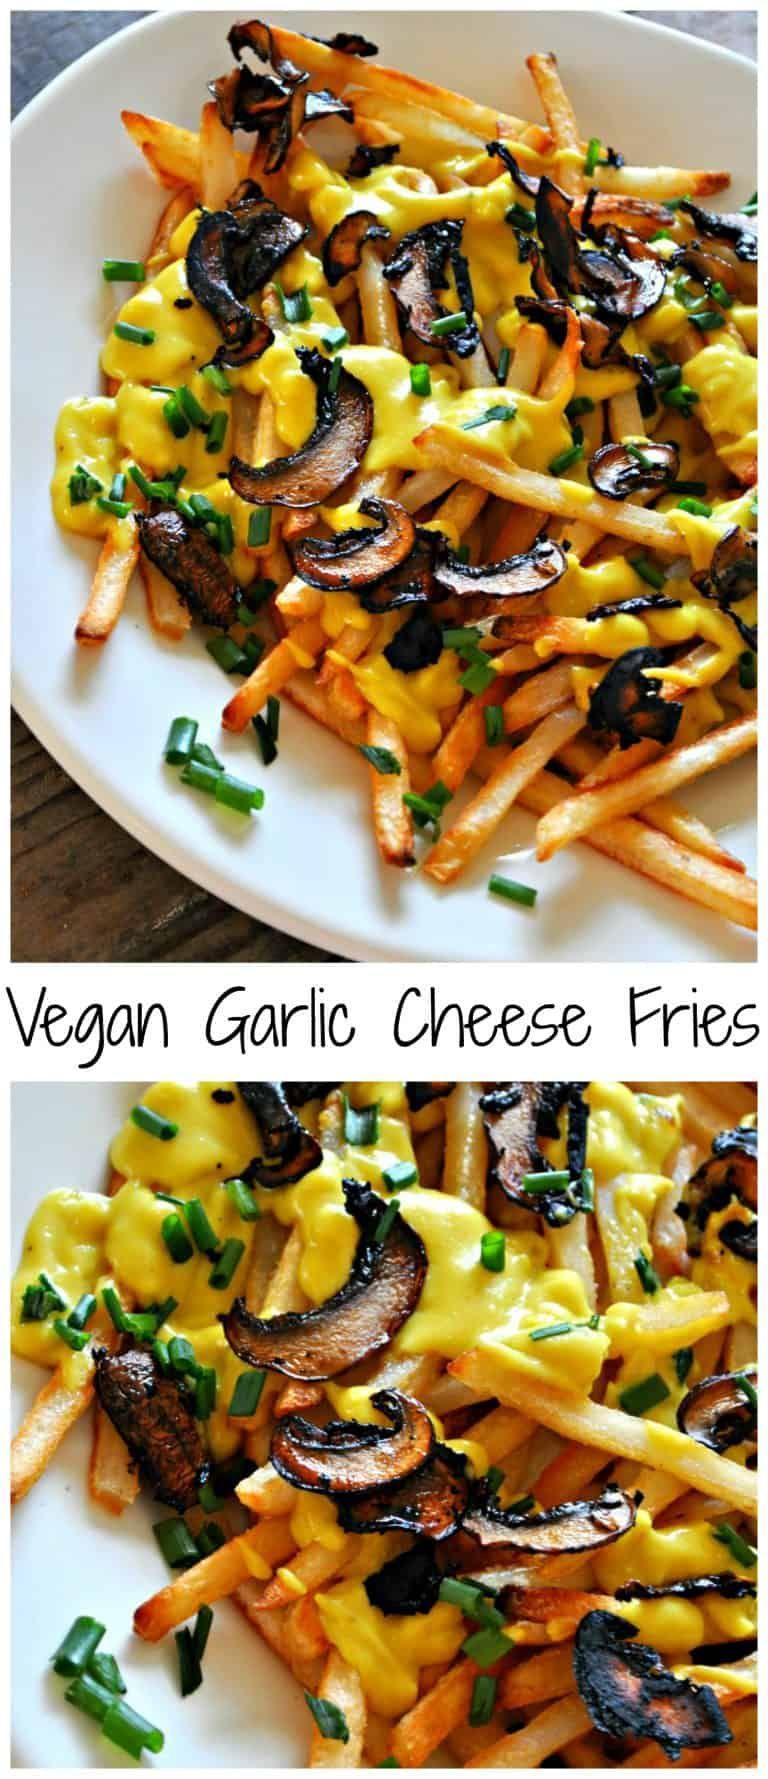 Vegan Garlic Cheese Fries Rabbit And Wolves Recipe Cheese Fries Recipes Vegan Condiments